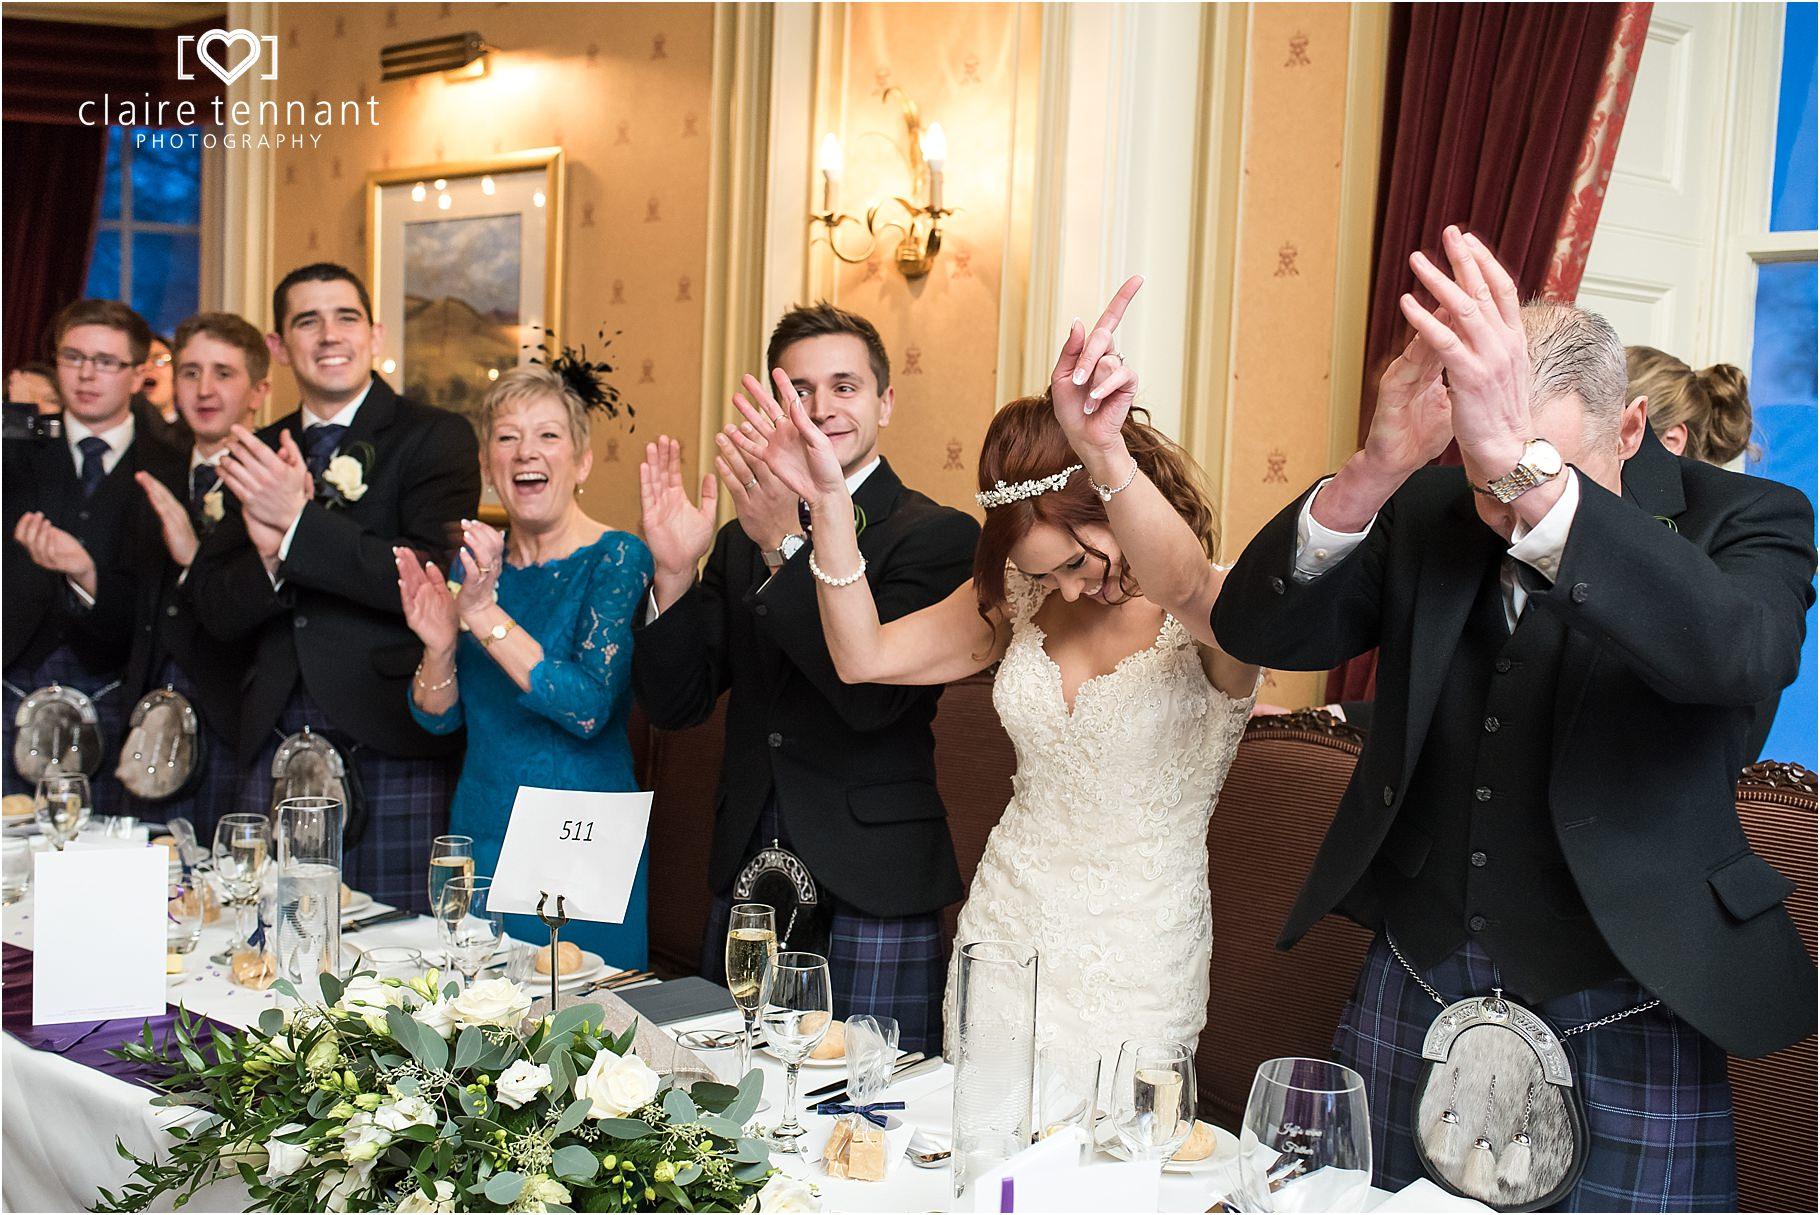 2016 wedding photography highlights Lothians